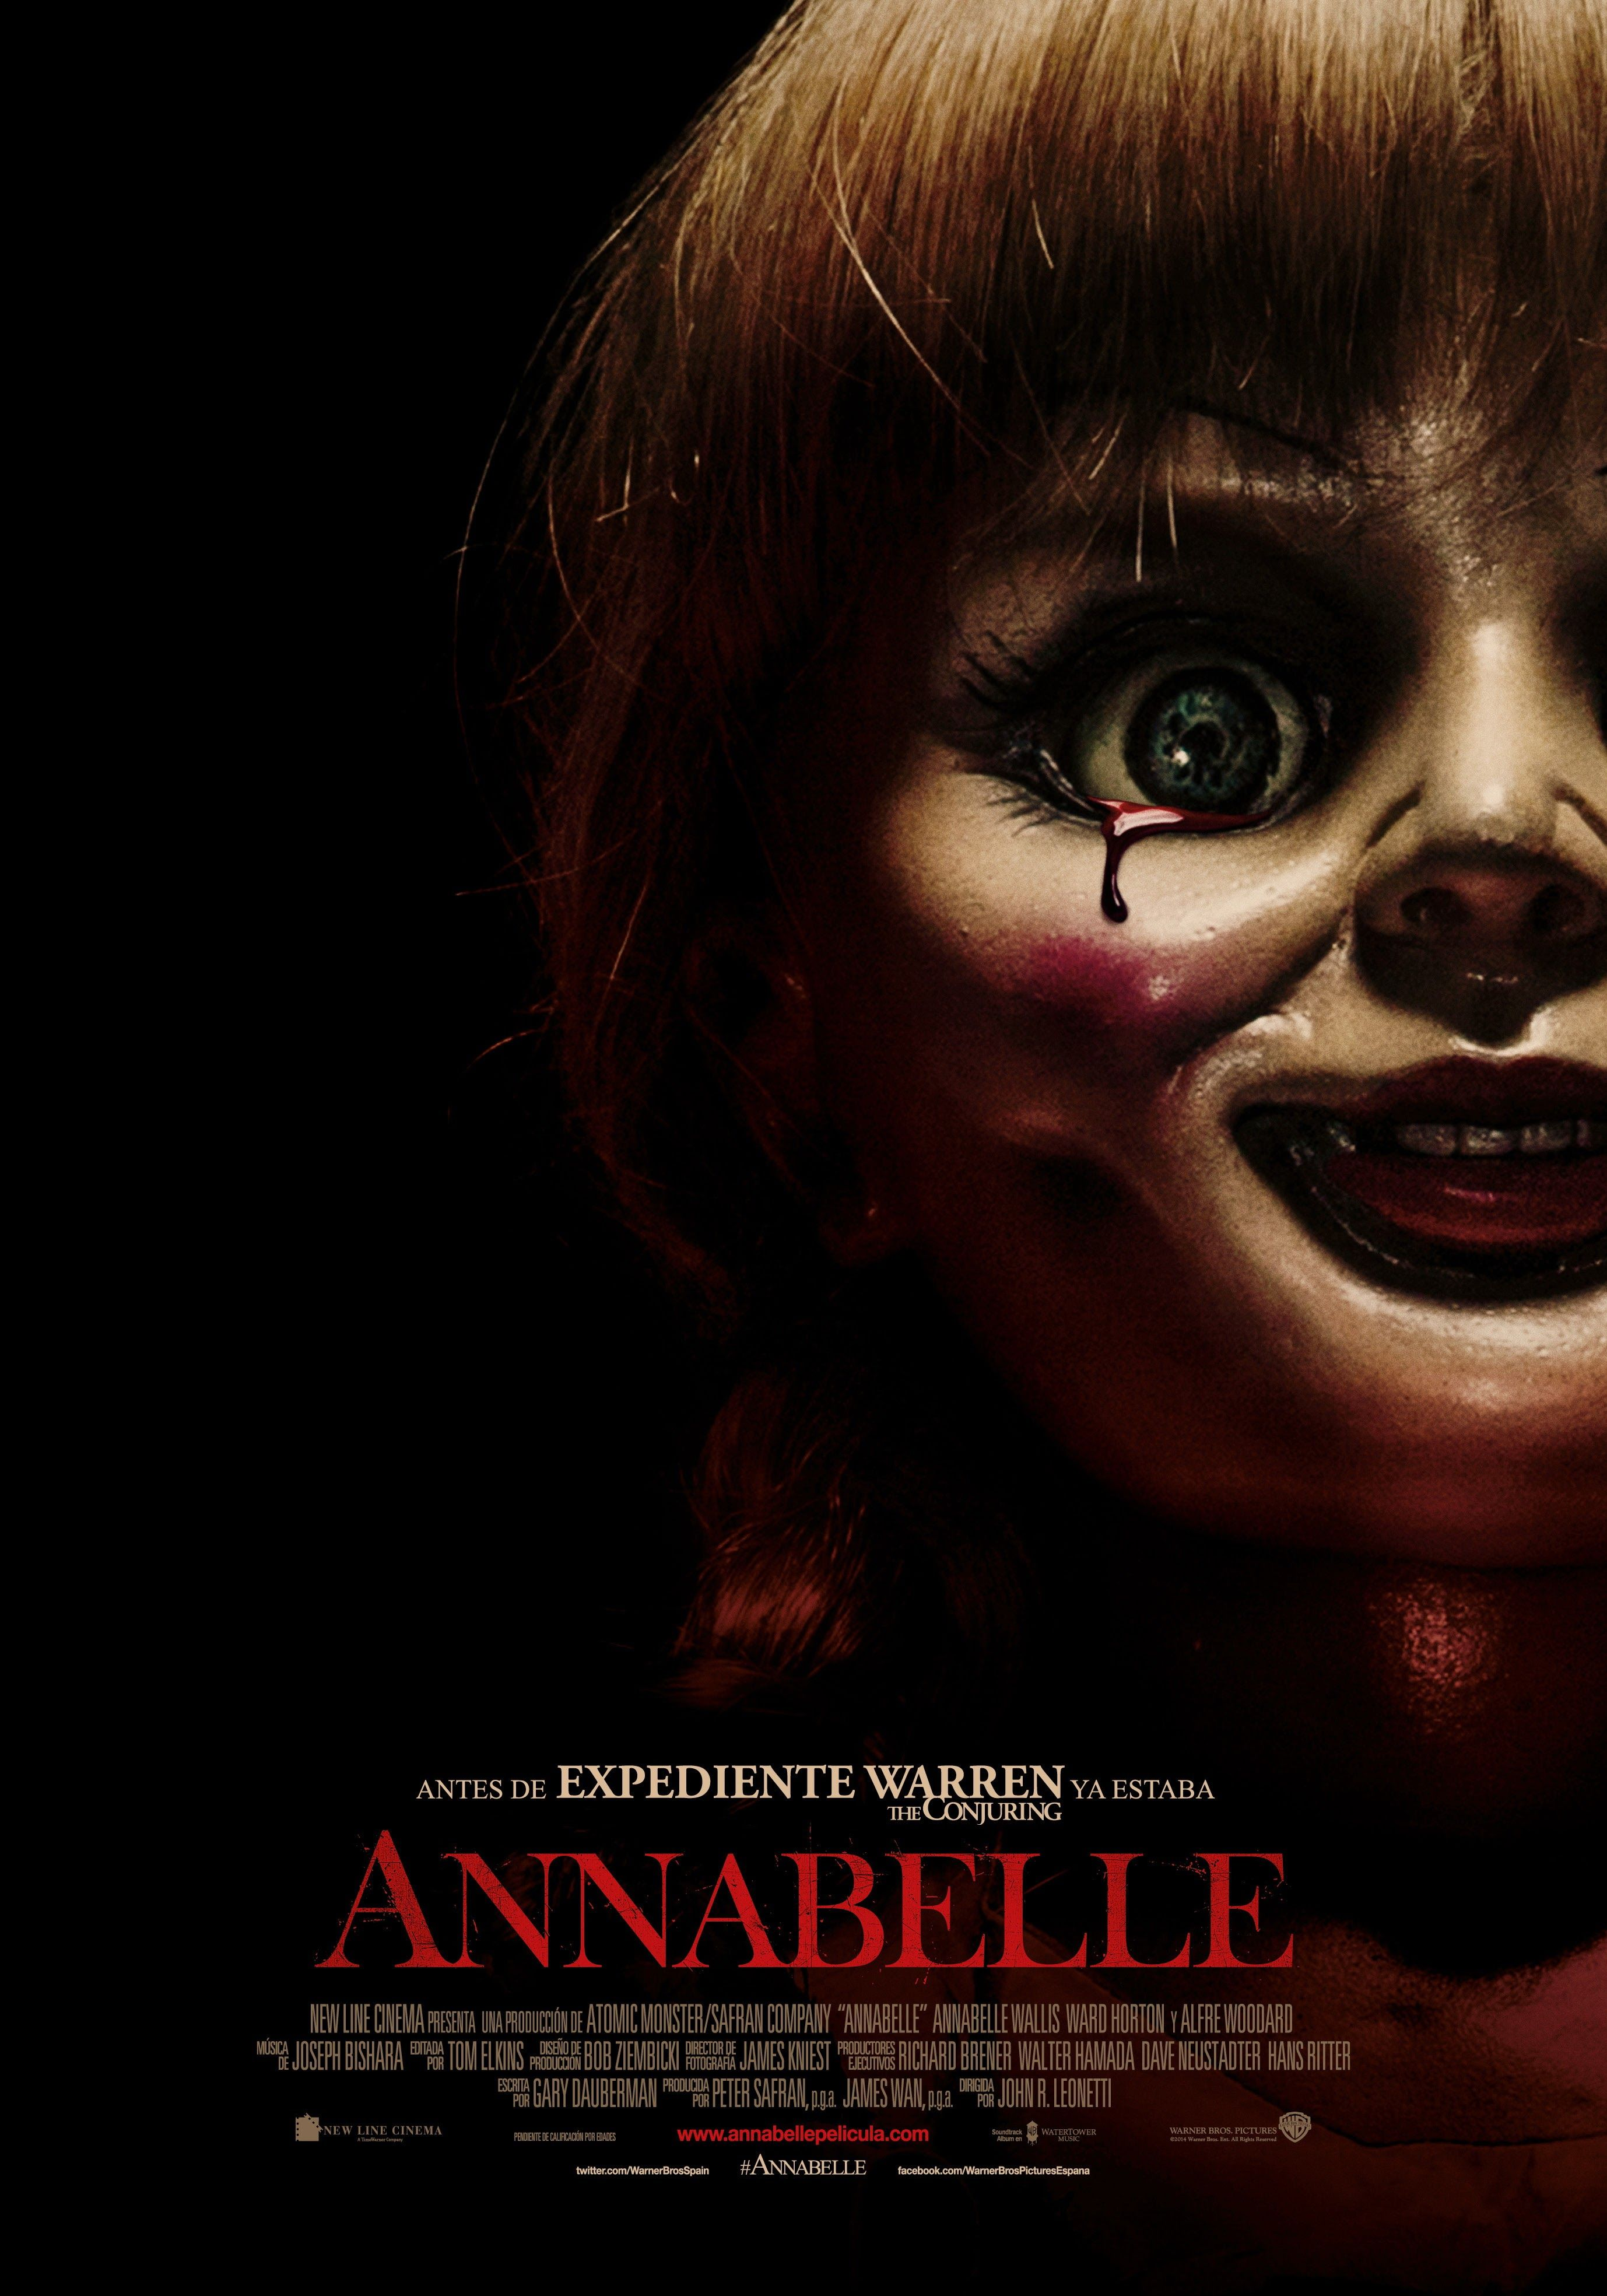 Annabelle Annabelle Pelicula Peliculas De Terror Peliculas